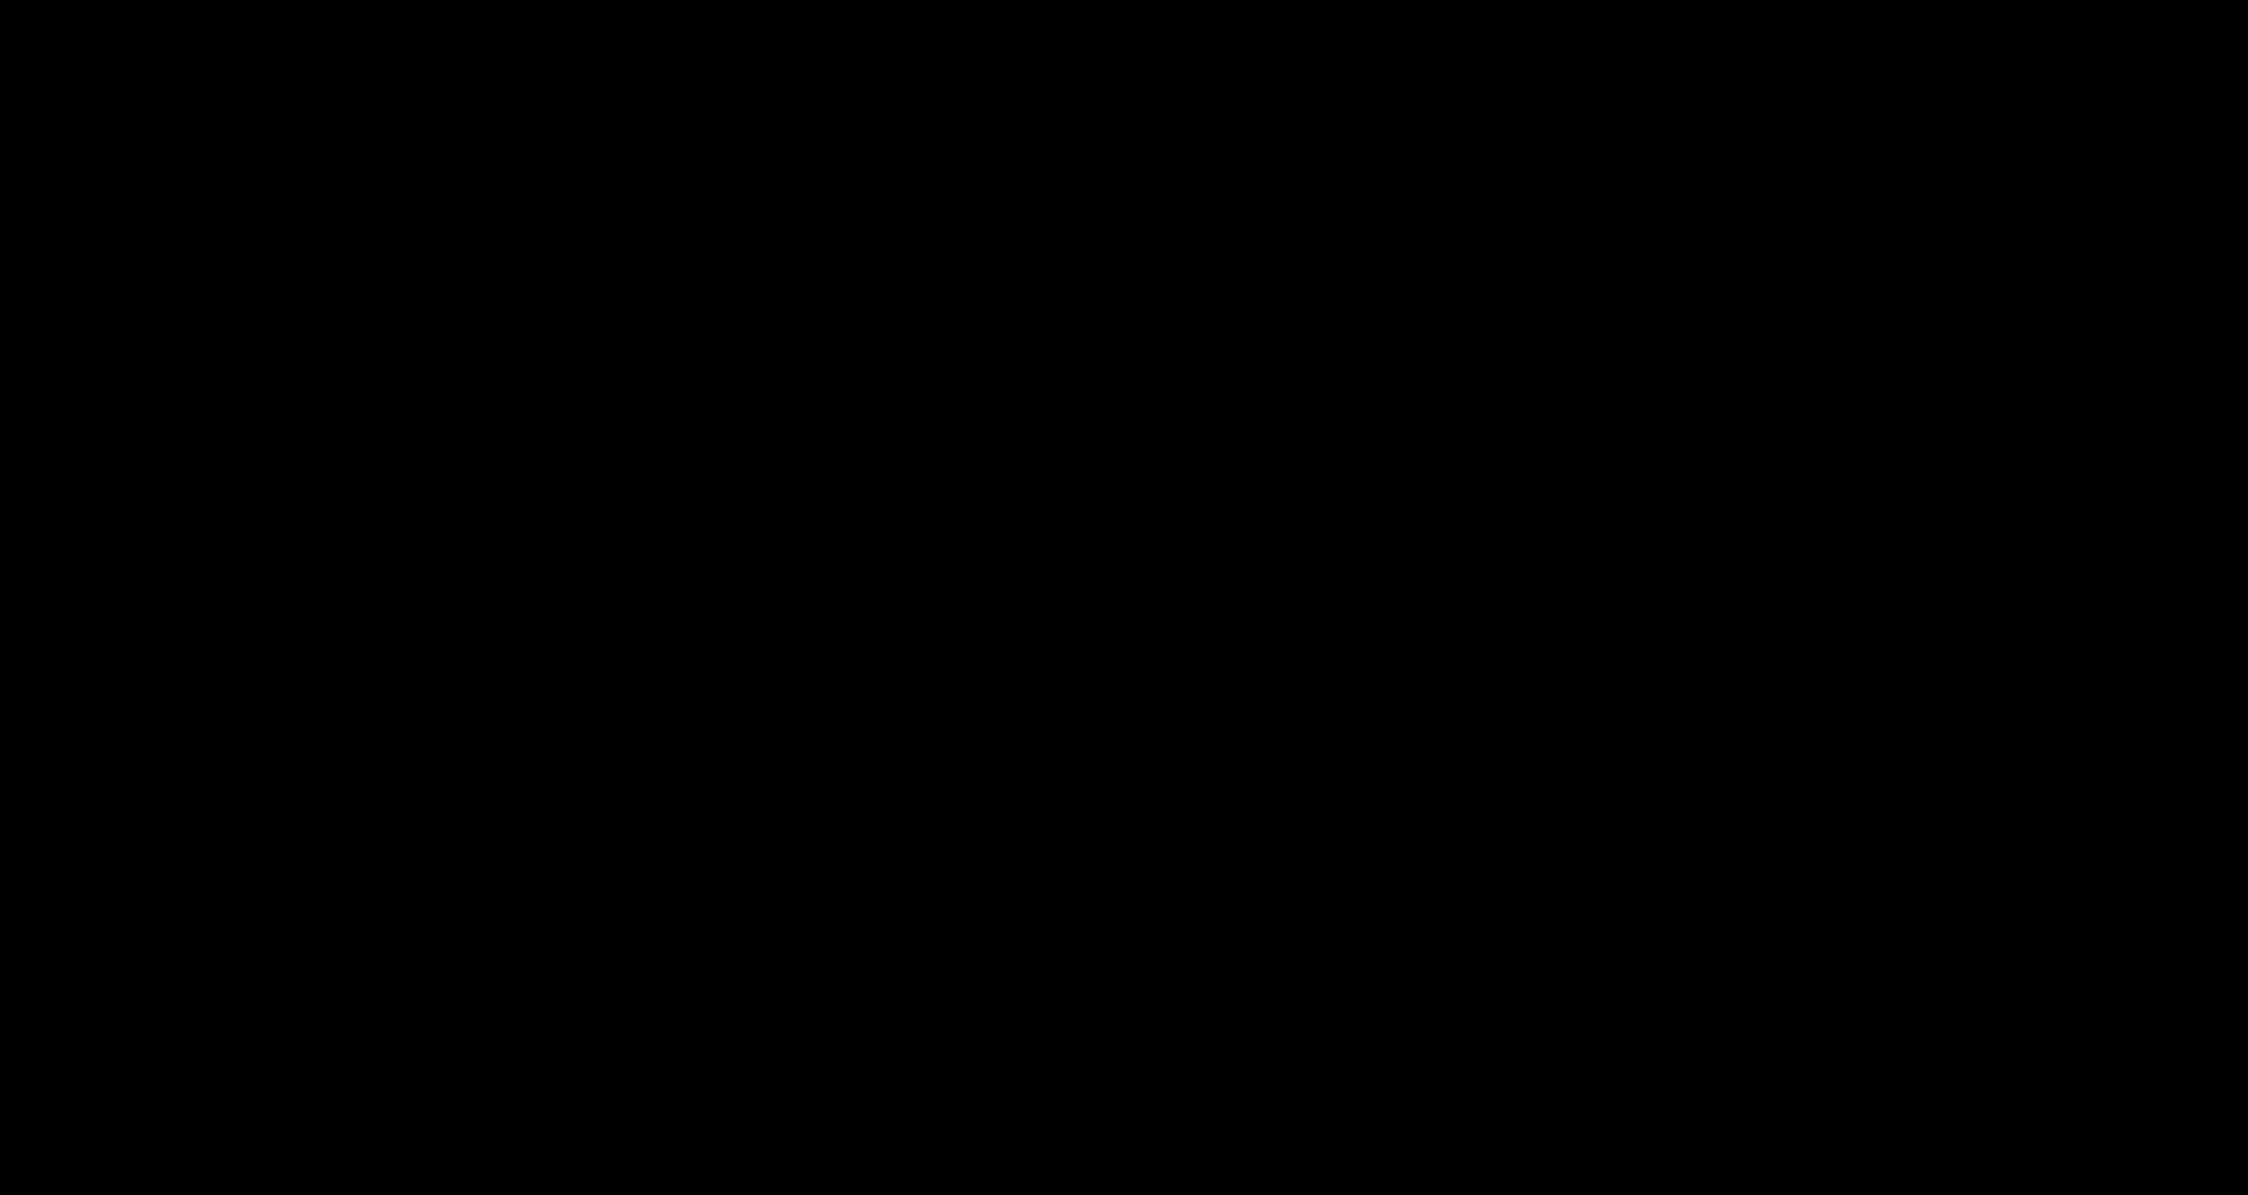 Distinctively optimized big image. French clipart icon